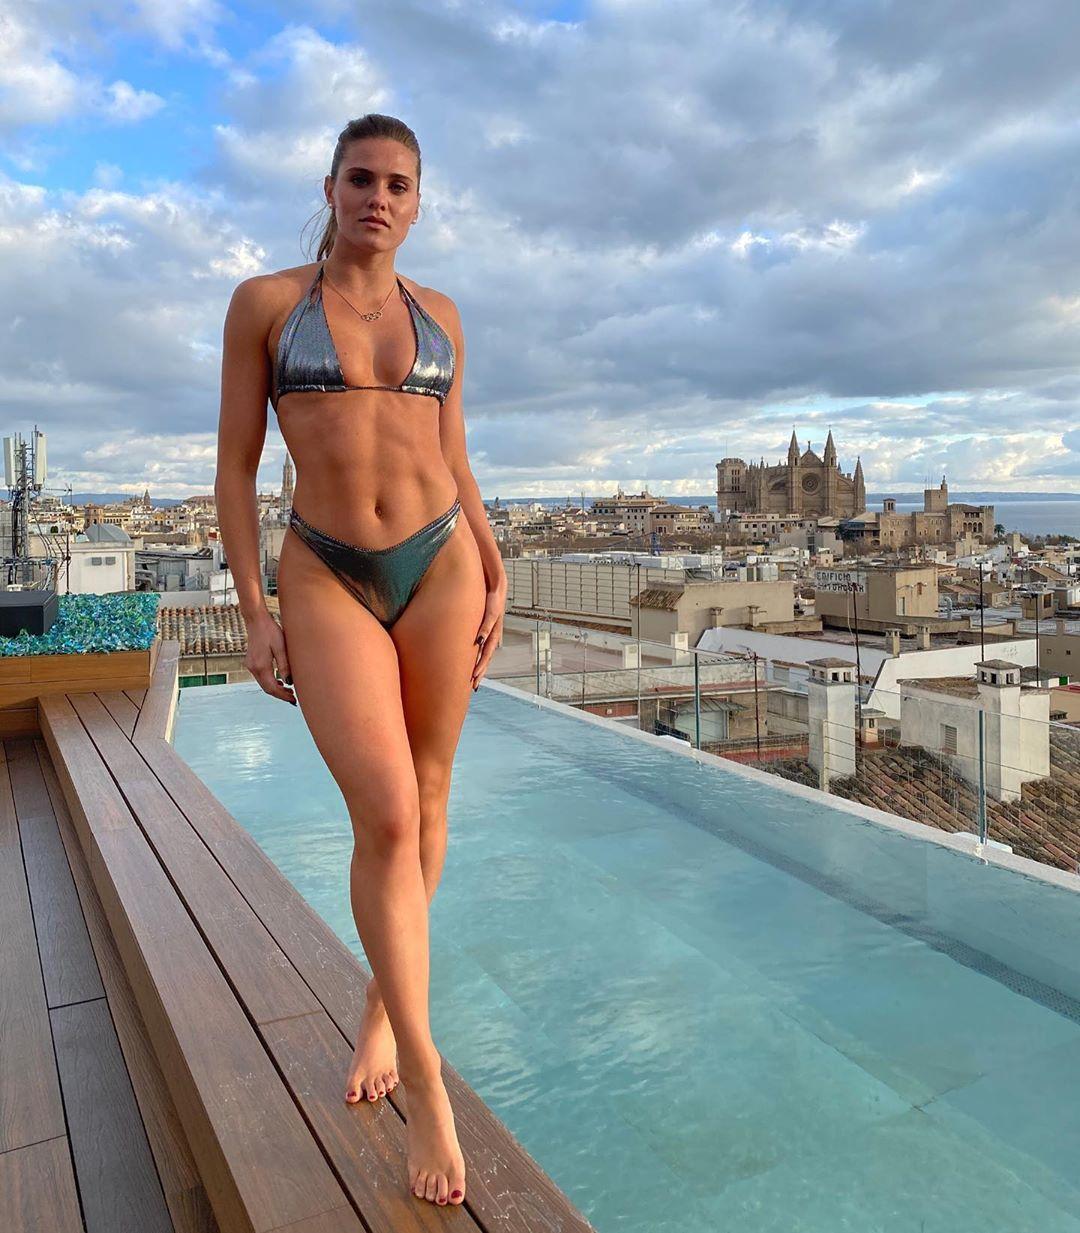 Alysha Newman Coming in Hot From Aruba! - Photo 4